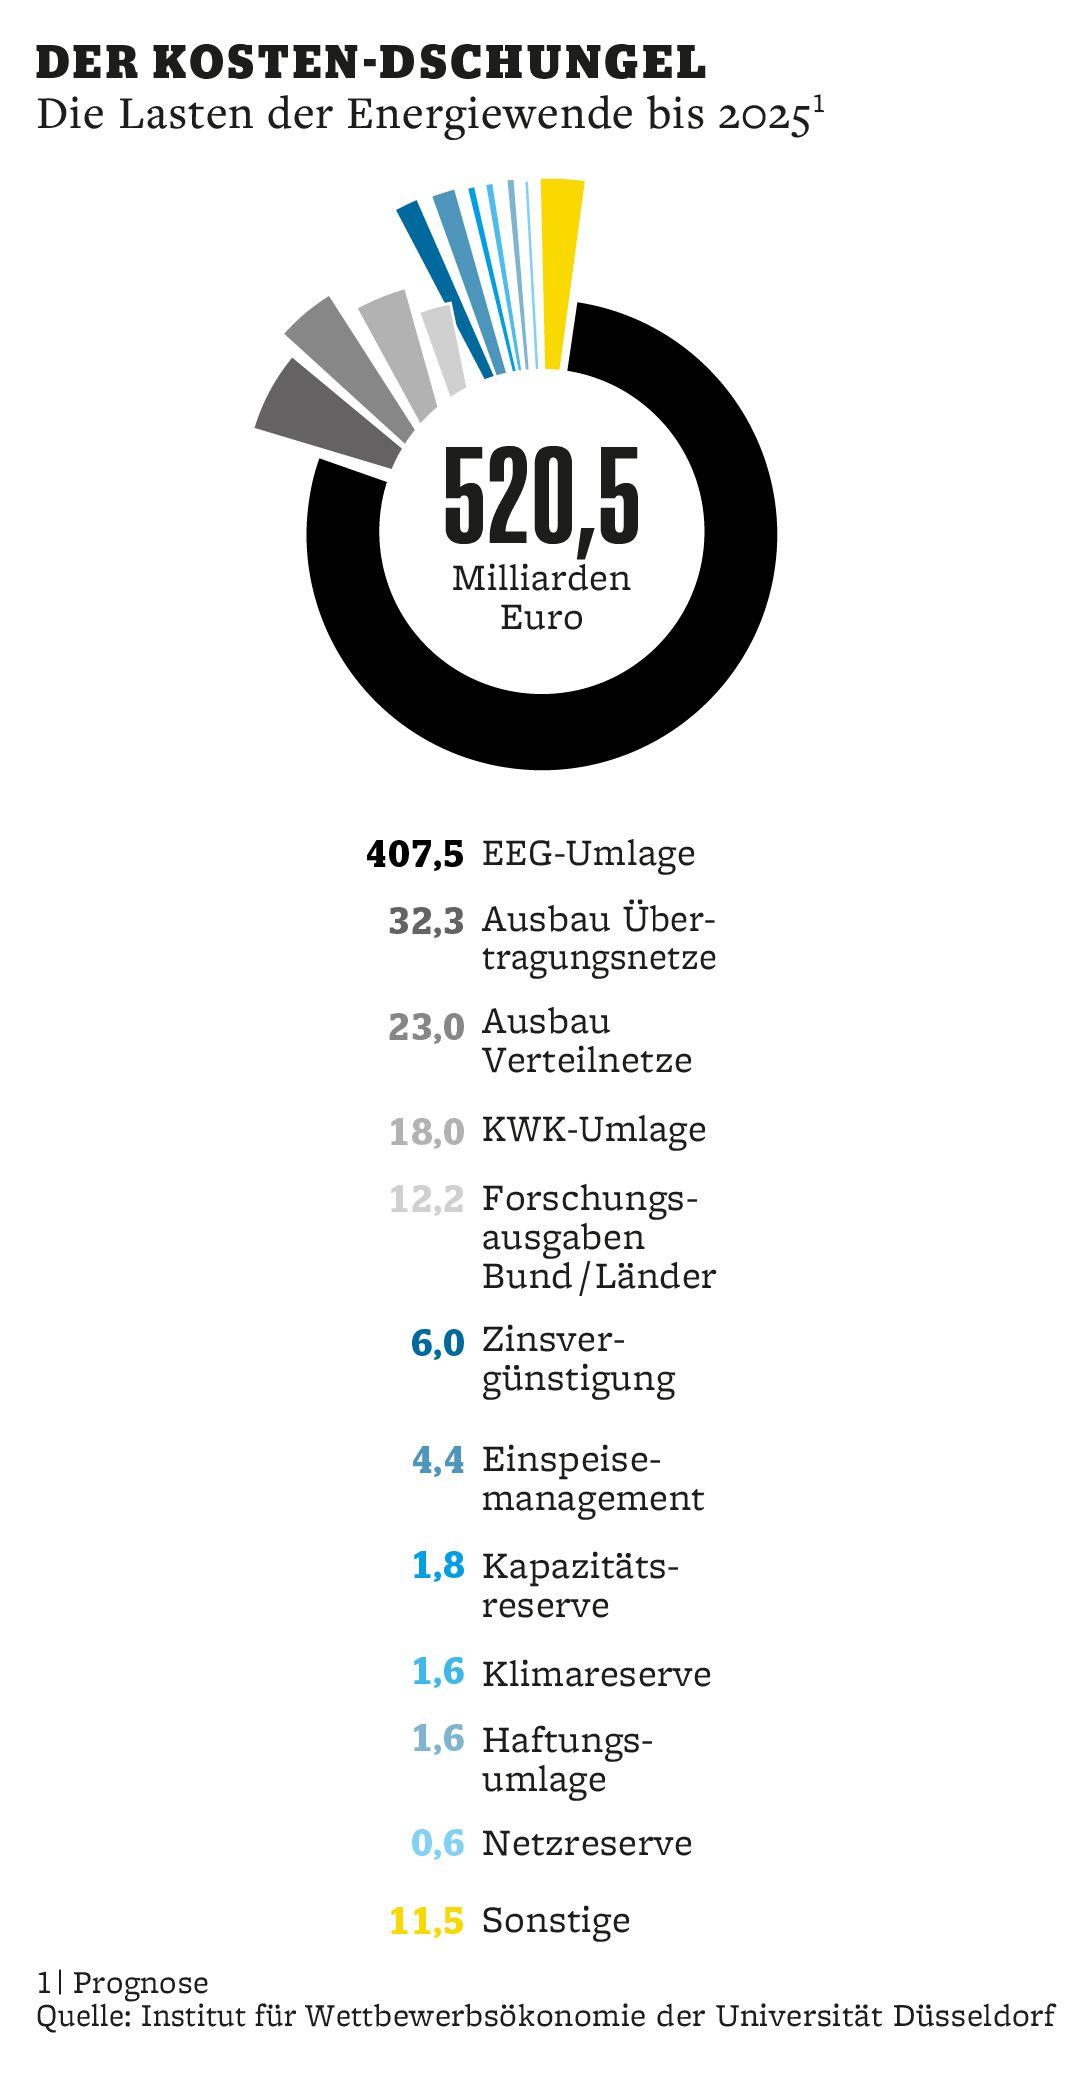 GRAFIK mm 11/17 S. 92 Energie